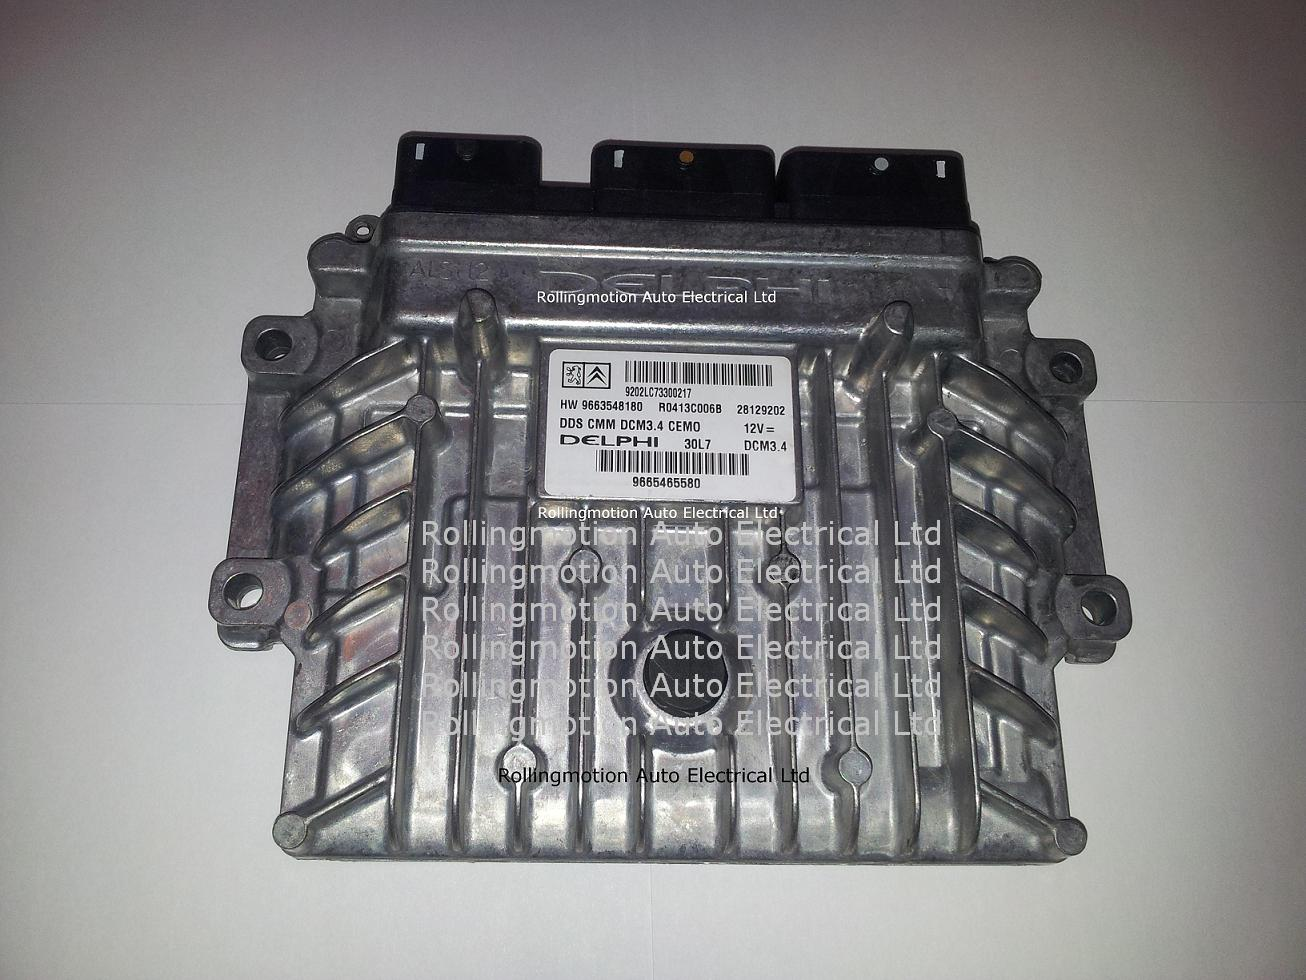 Psa Bsi Repairs Citroen C3 Wiring Diagram Disclaimer